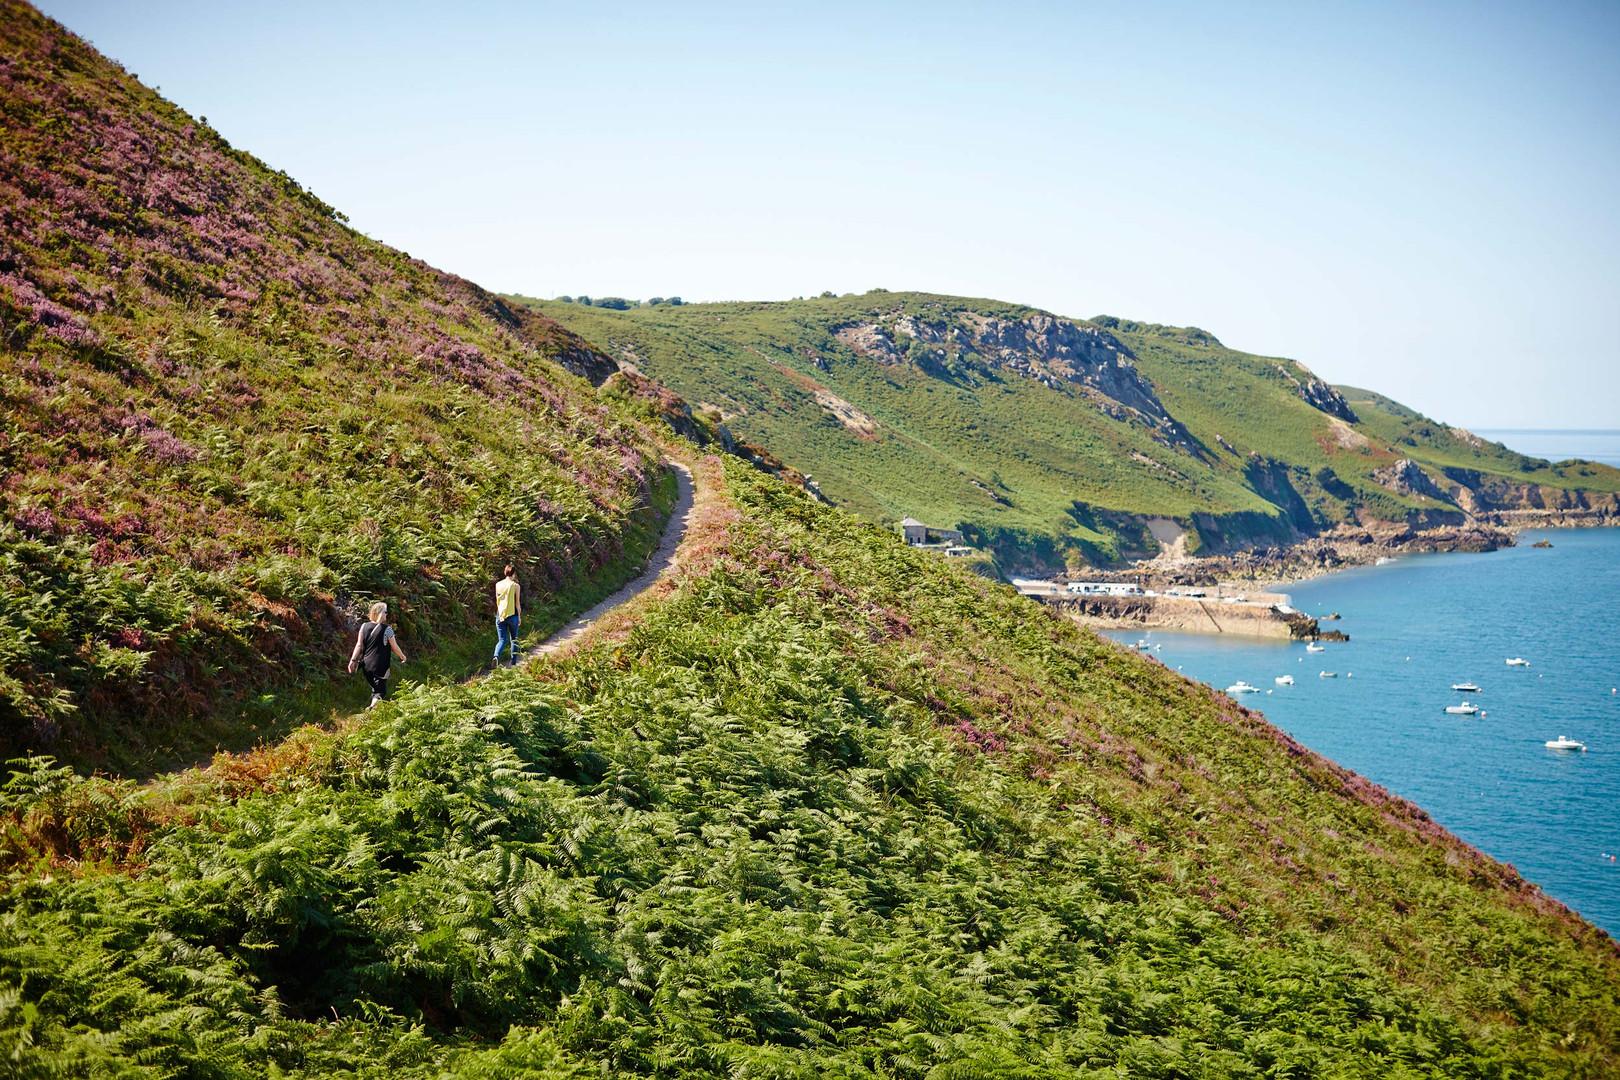 North Coast cliff paths